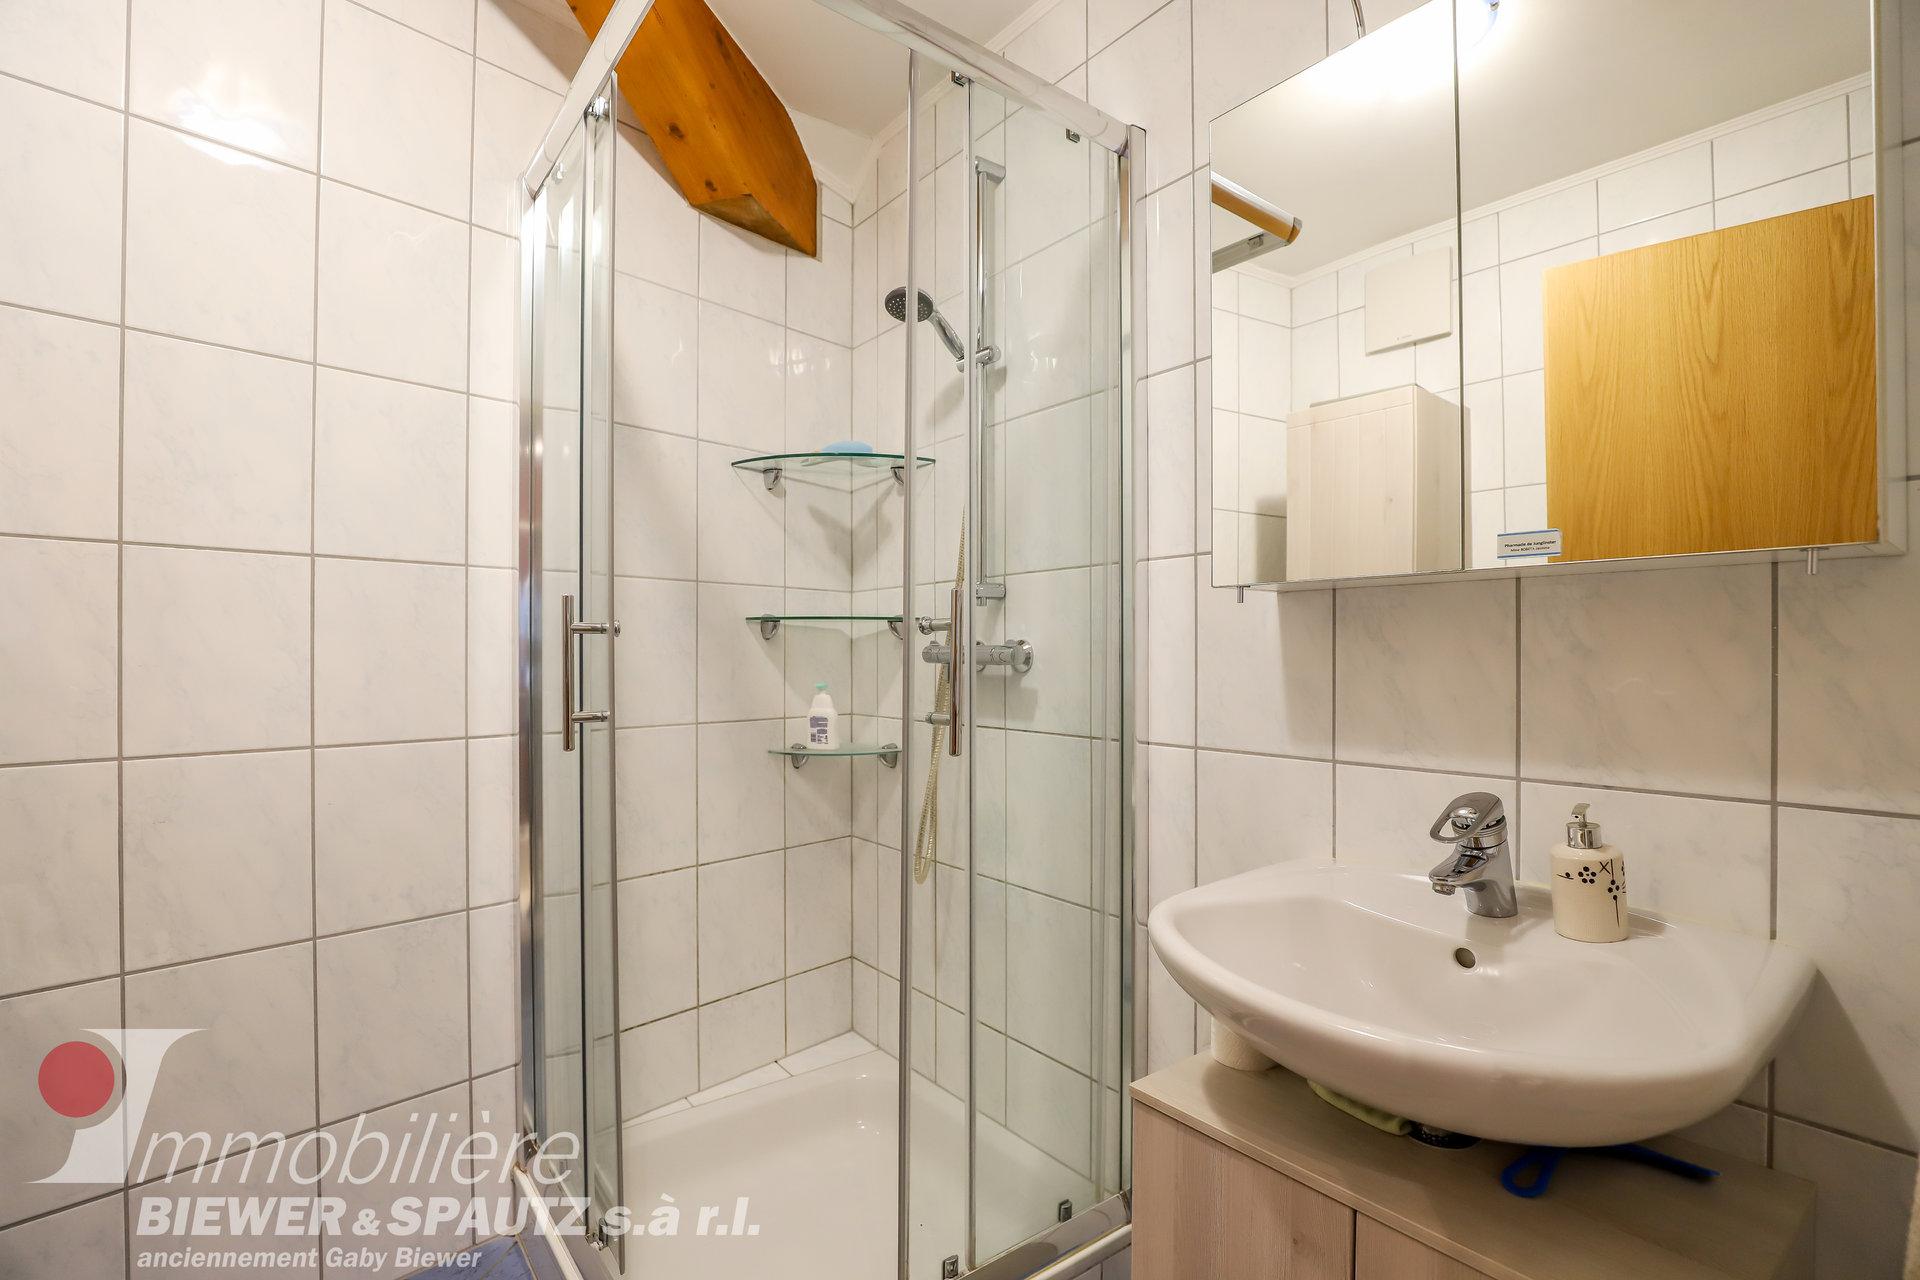 RENTED - apartment with 2 bedrooms in Echternach